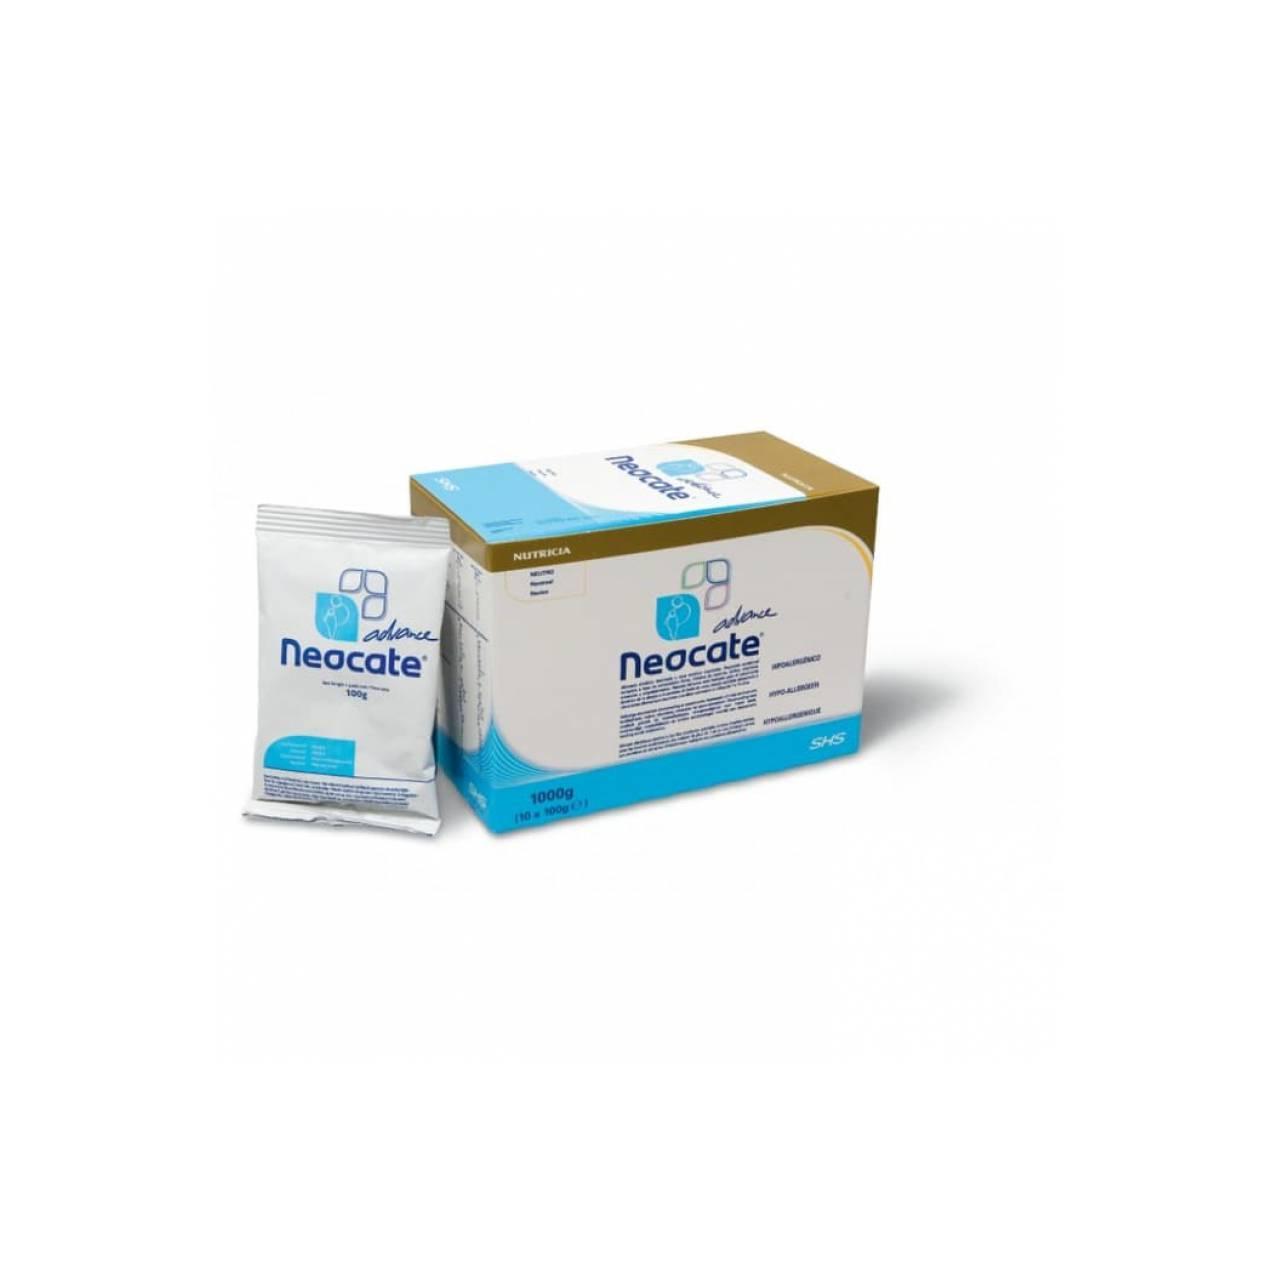 Buy Sell Cheapest Nutricia Susu Formula Best Quality Product Deals Rajasusu Bebelove 2 800 Gr Neocate Advance 1000 10x100gr